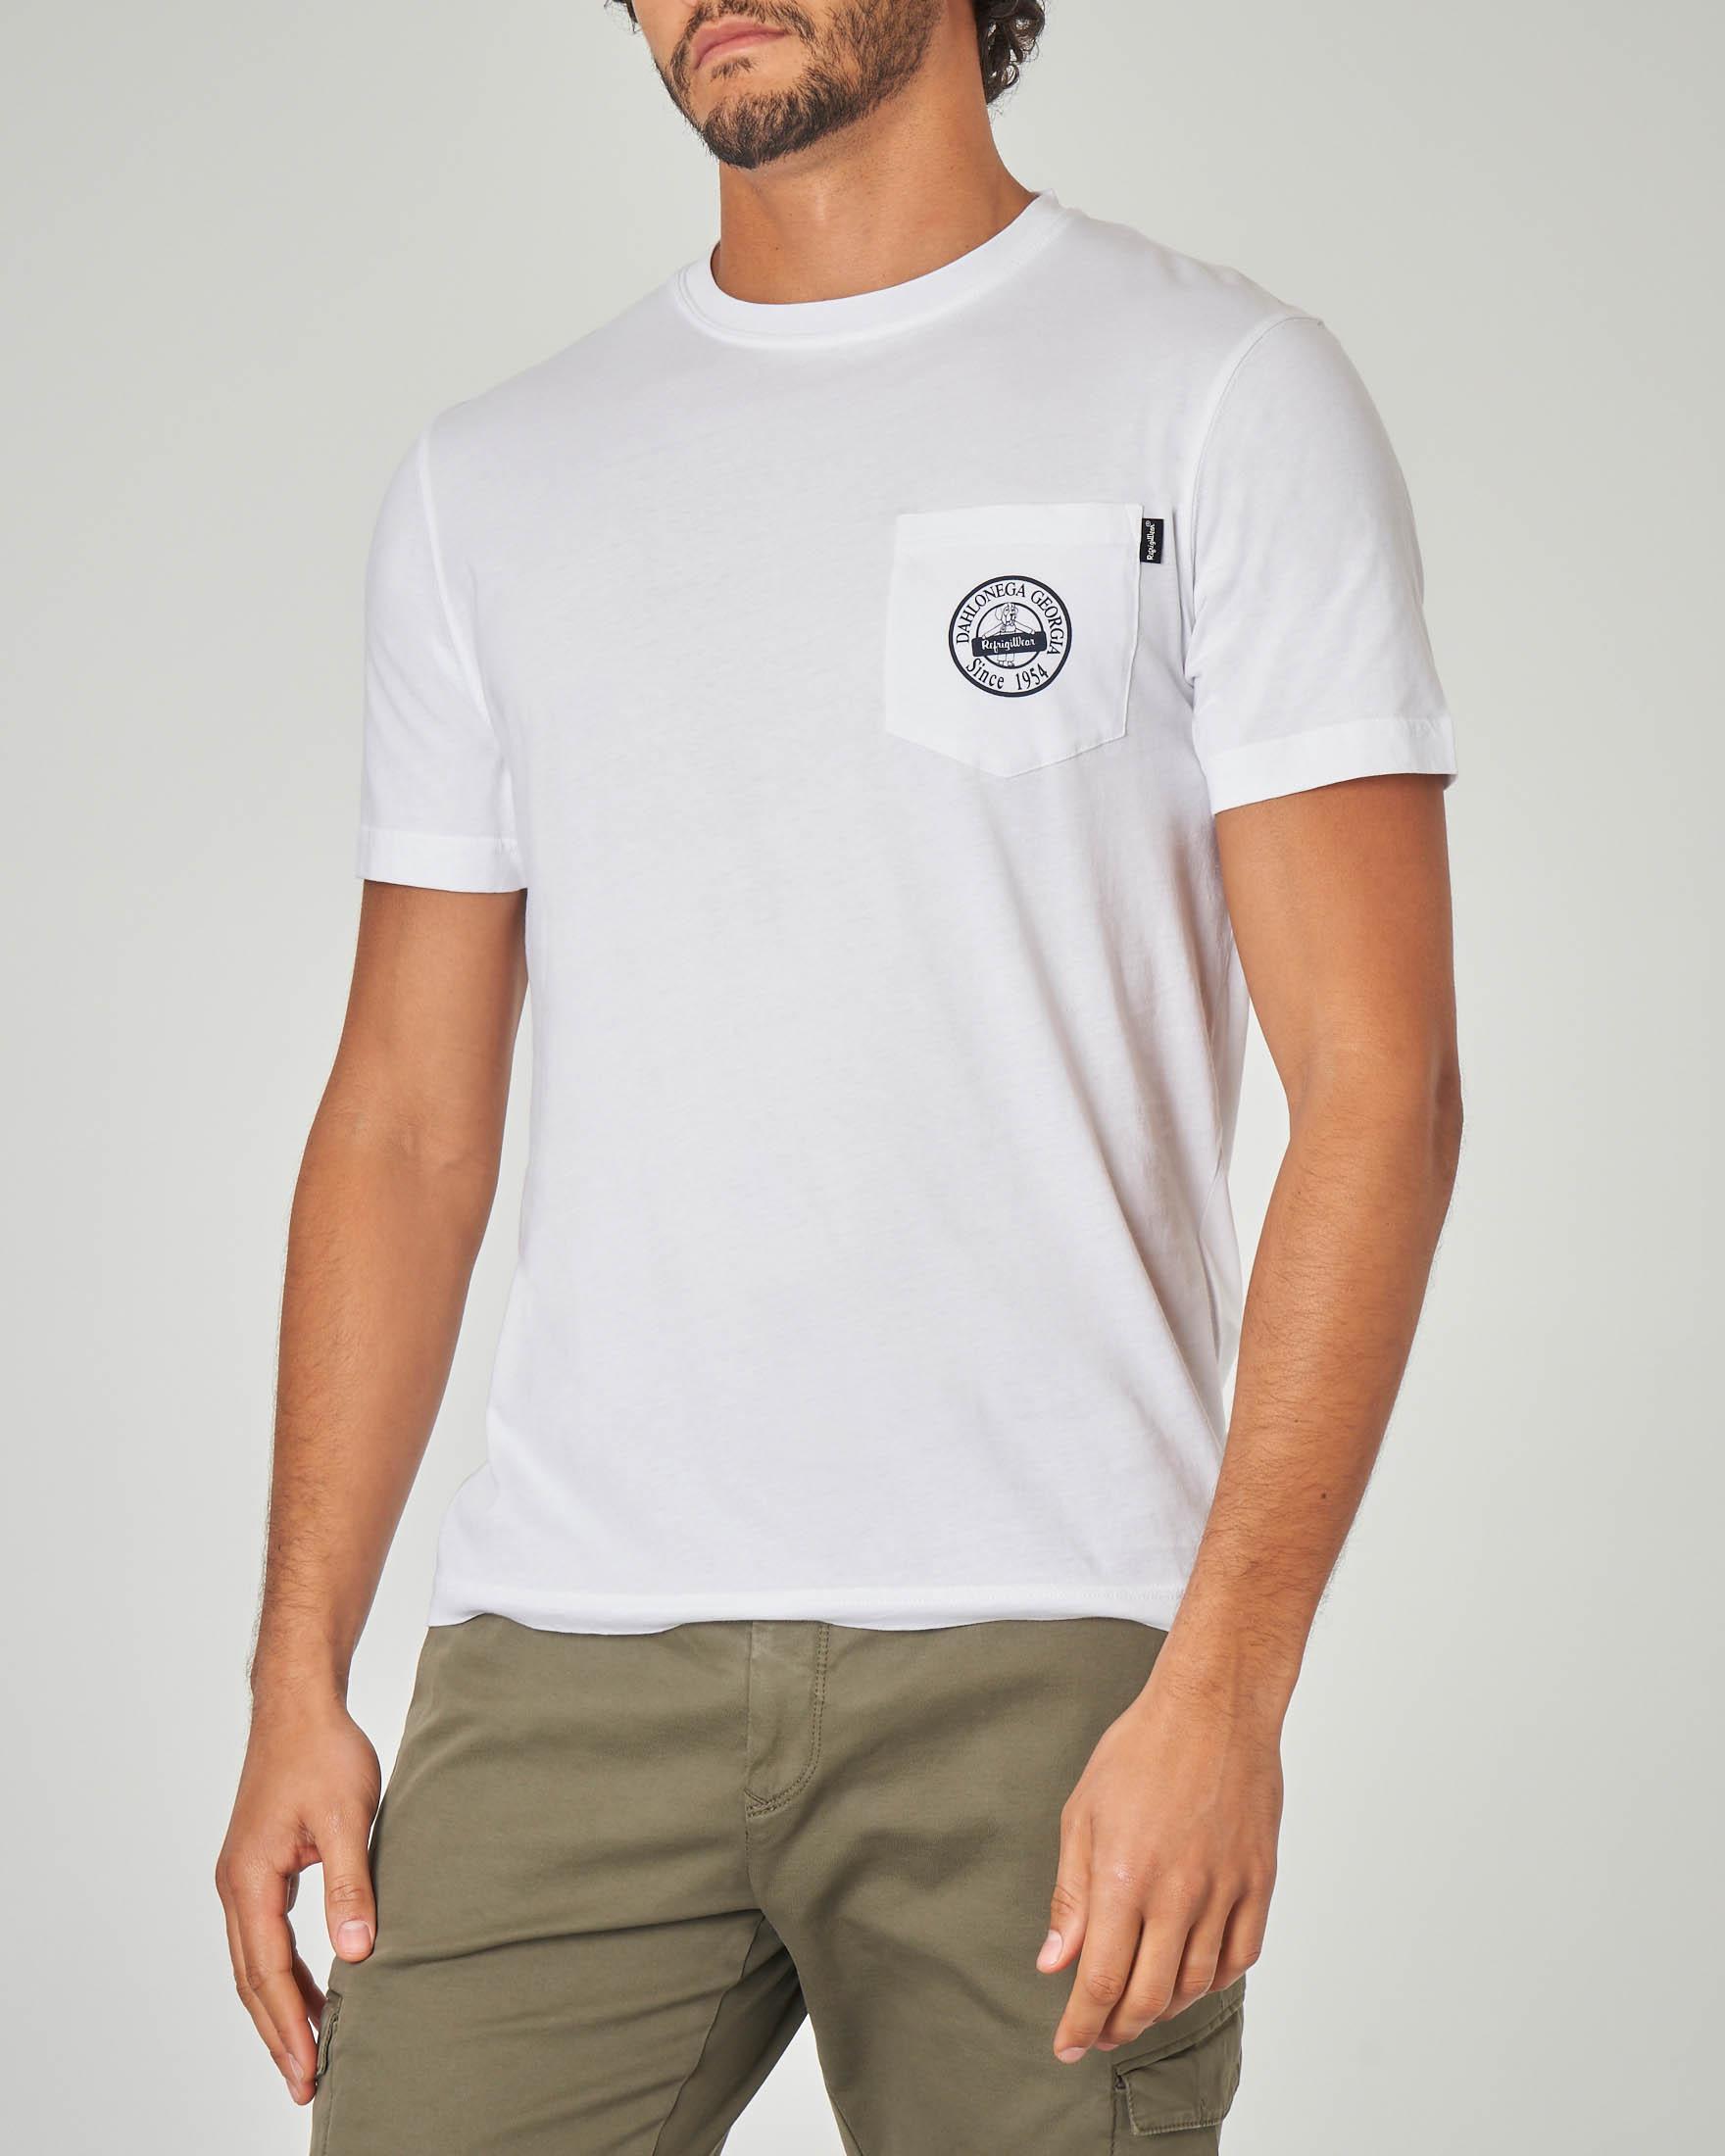 T-shirt bianca con taschino e logo stampato